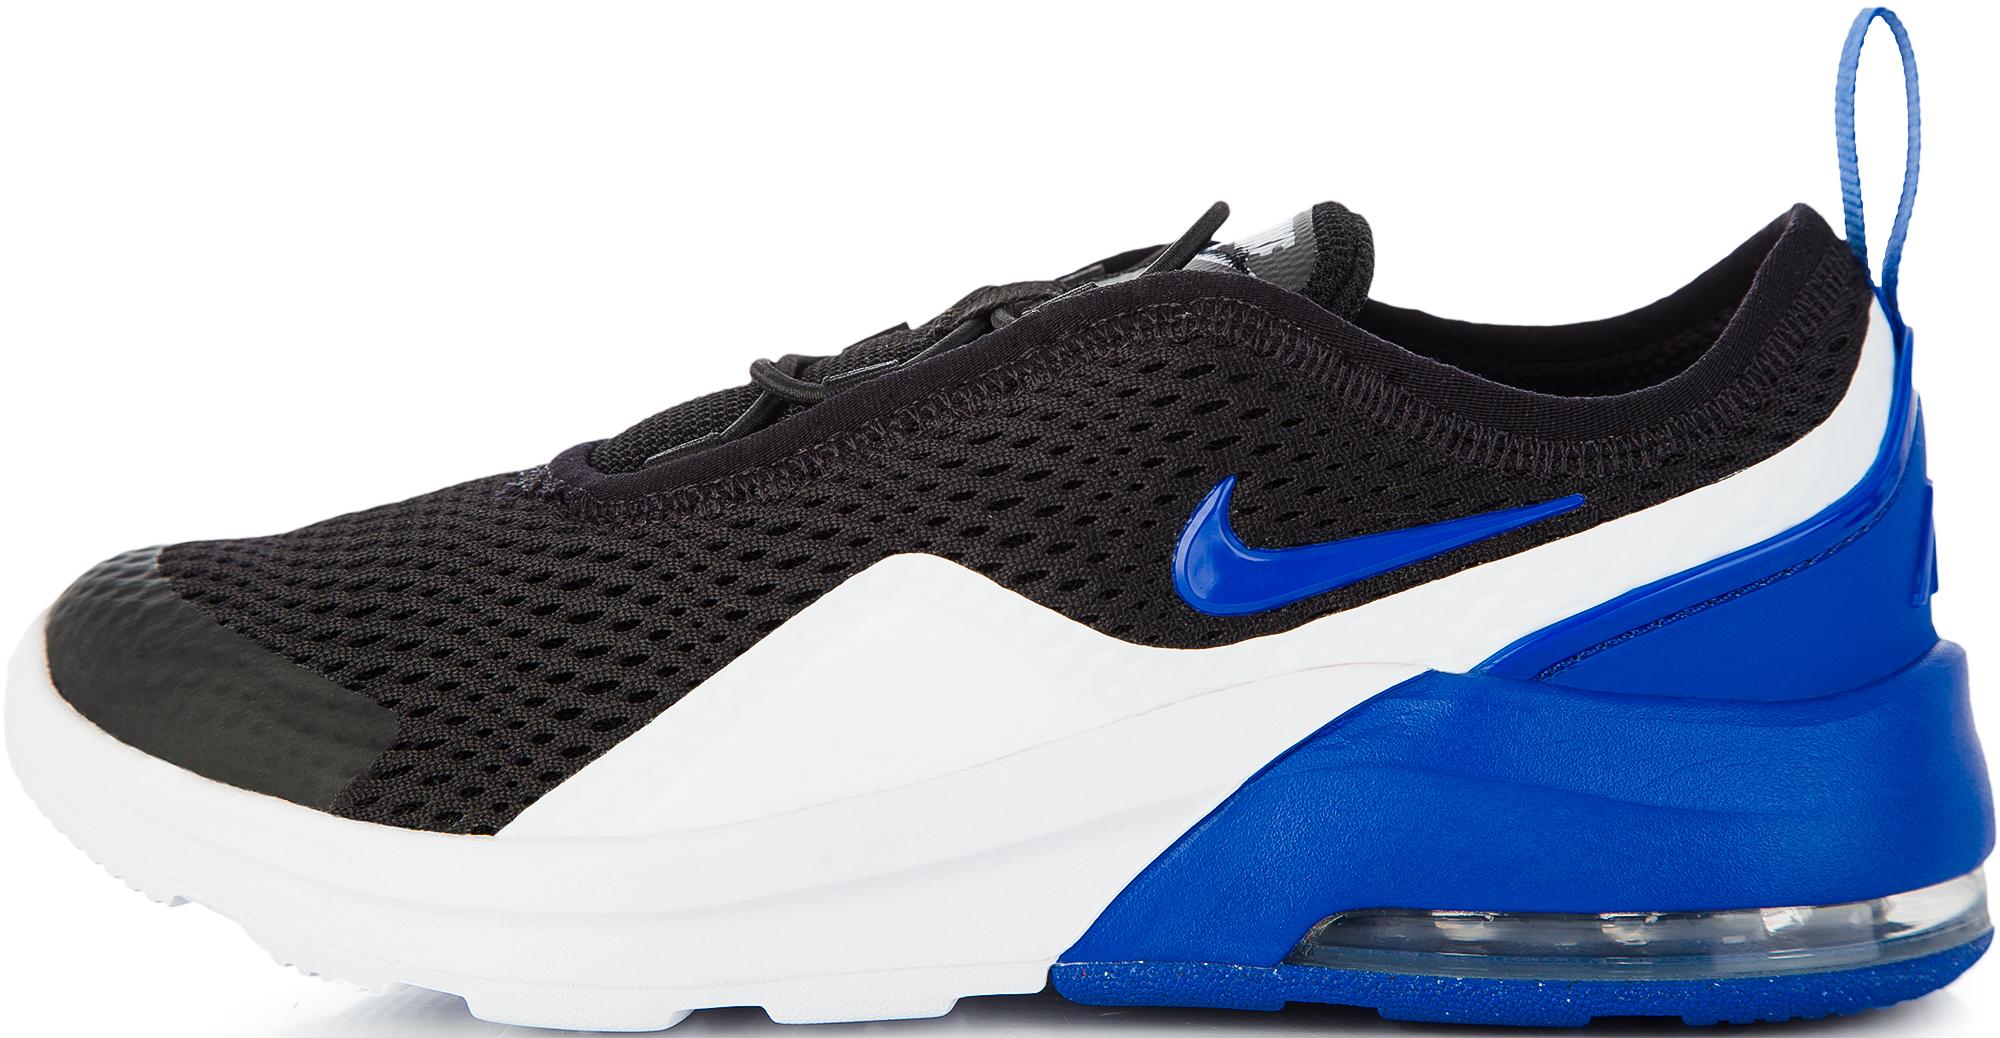 Nike Кроссовки для мальчиков Nike Air Max Motion 2, размер 33 цены онлайн